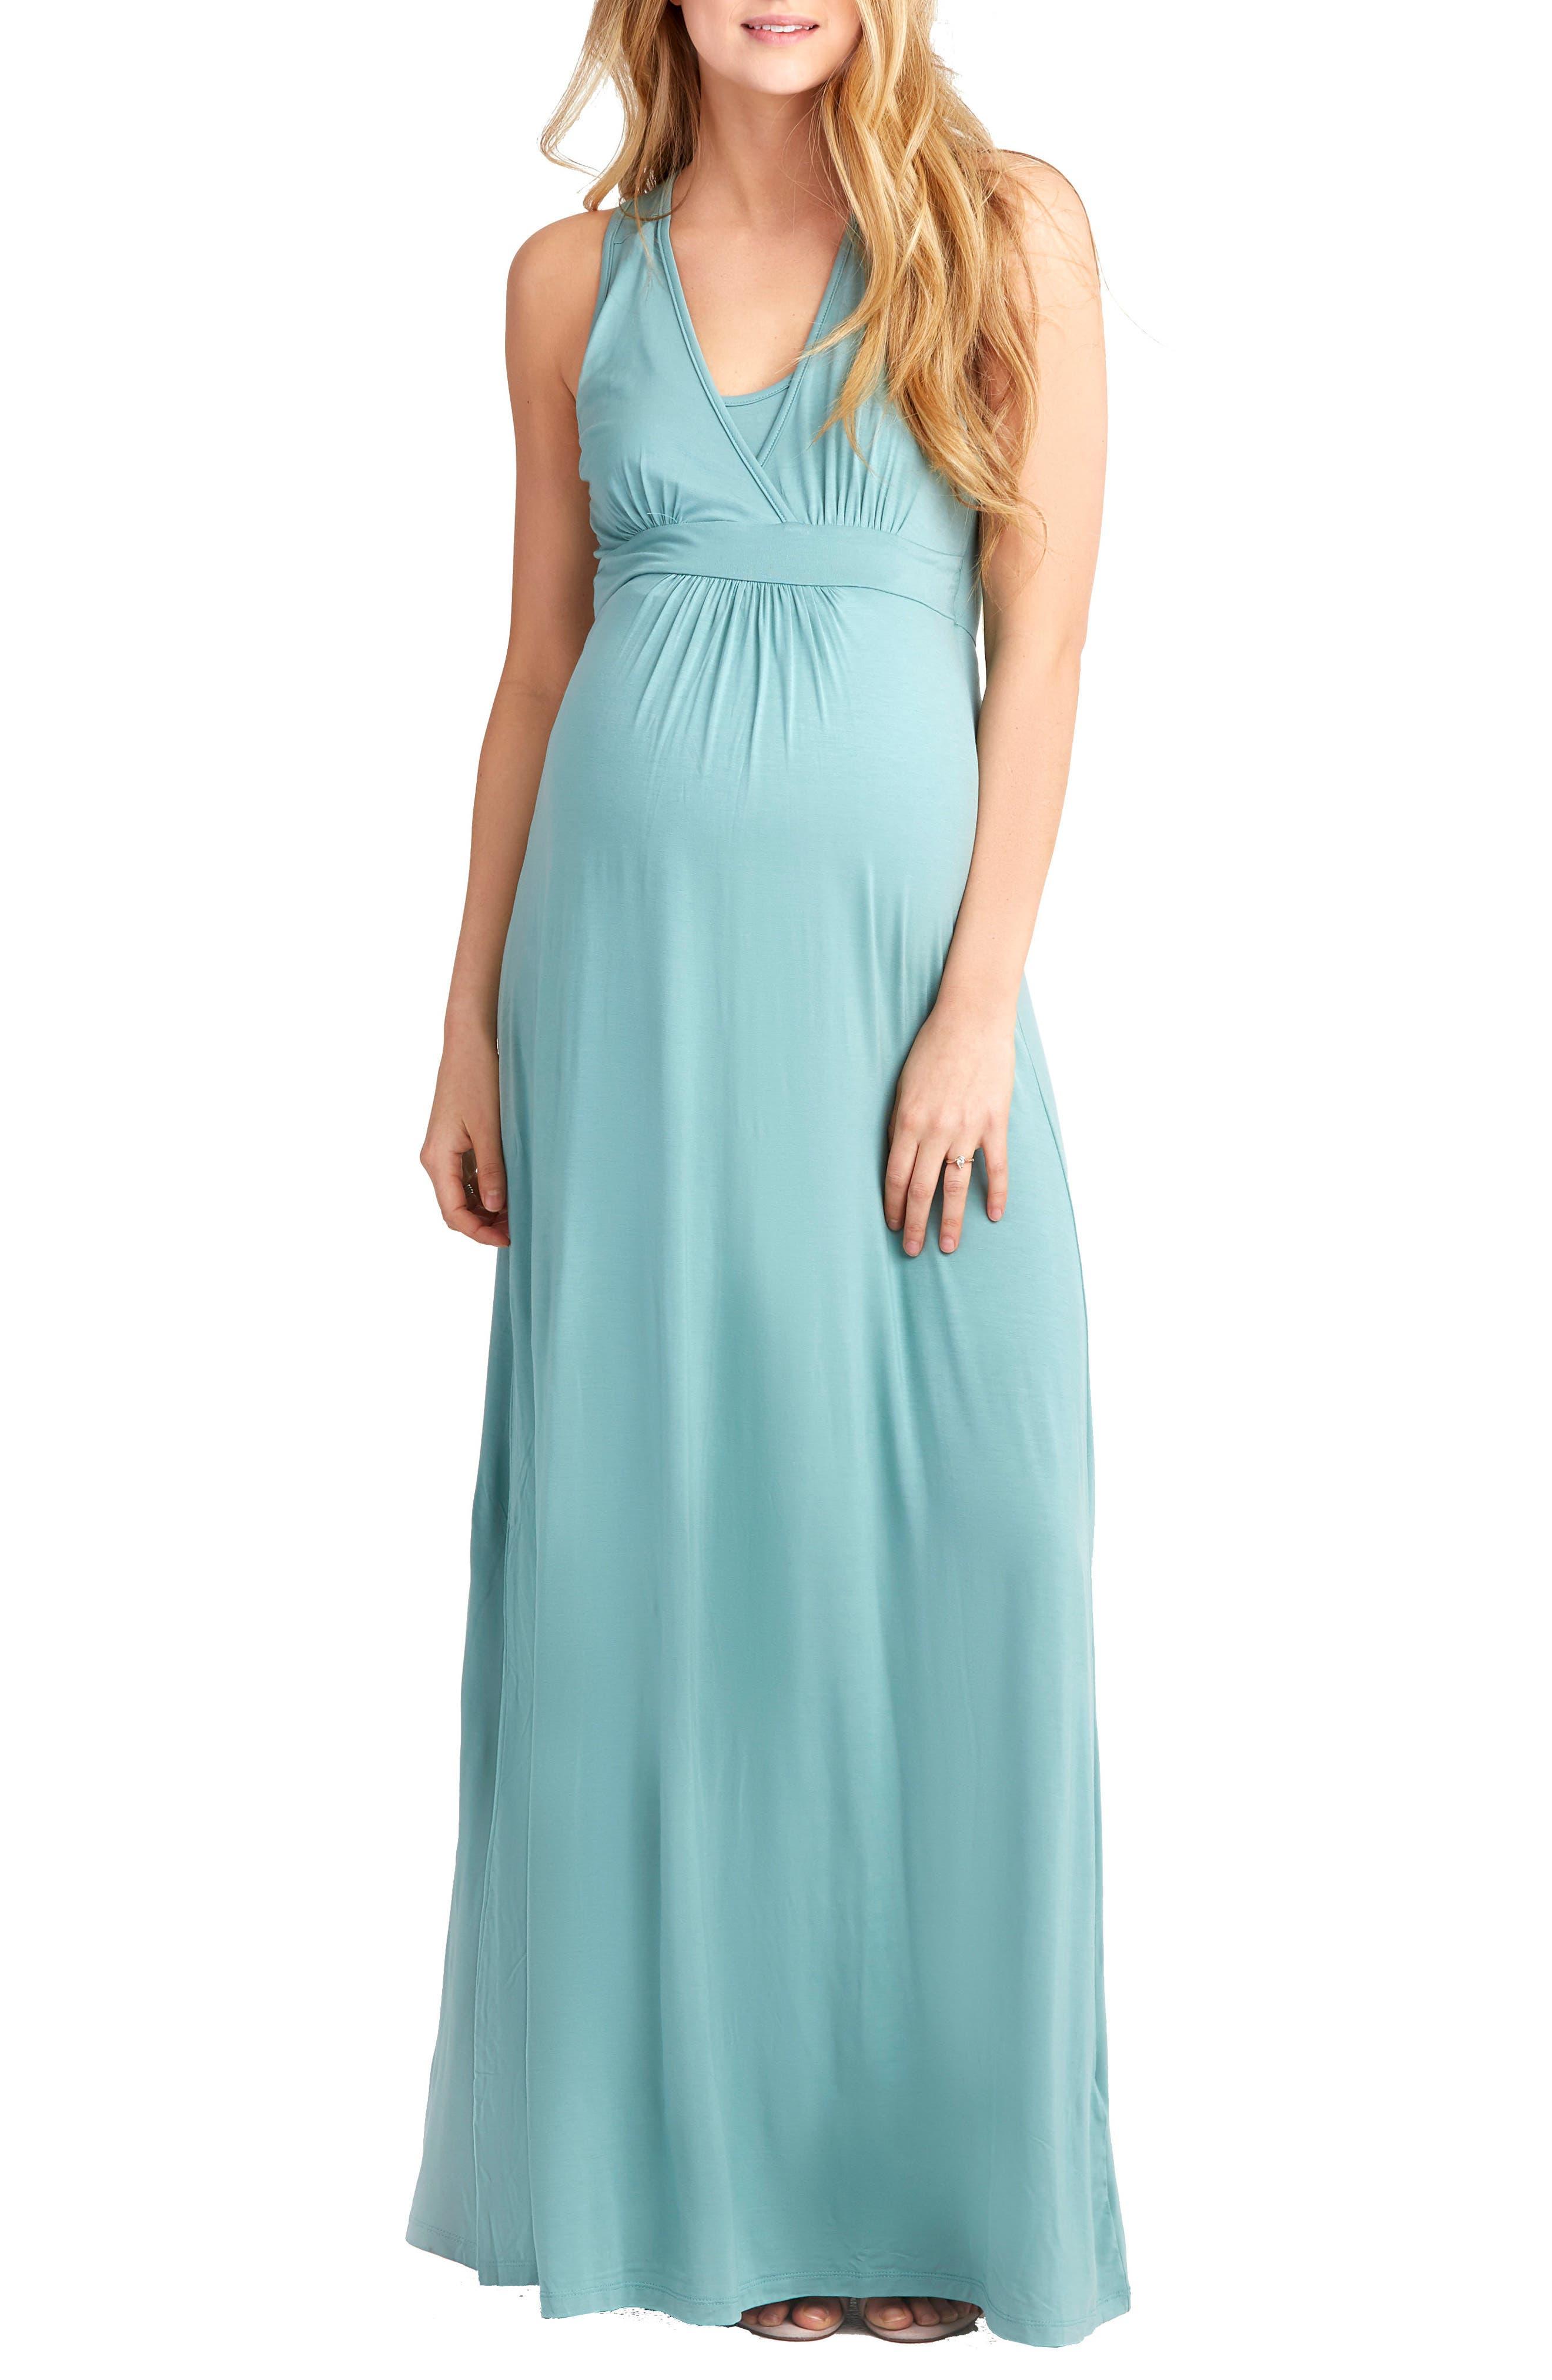 Main Image - Nom Maternity Hollis Maternity/Nursing Maxi Dress